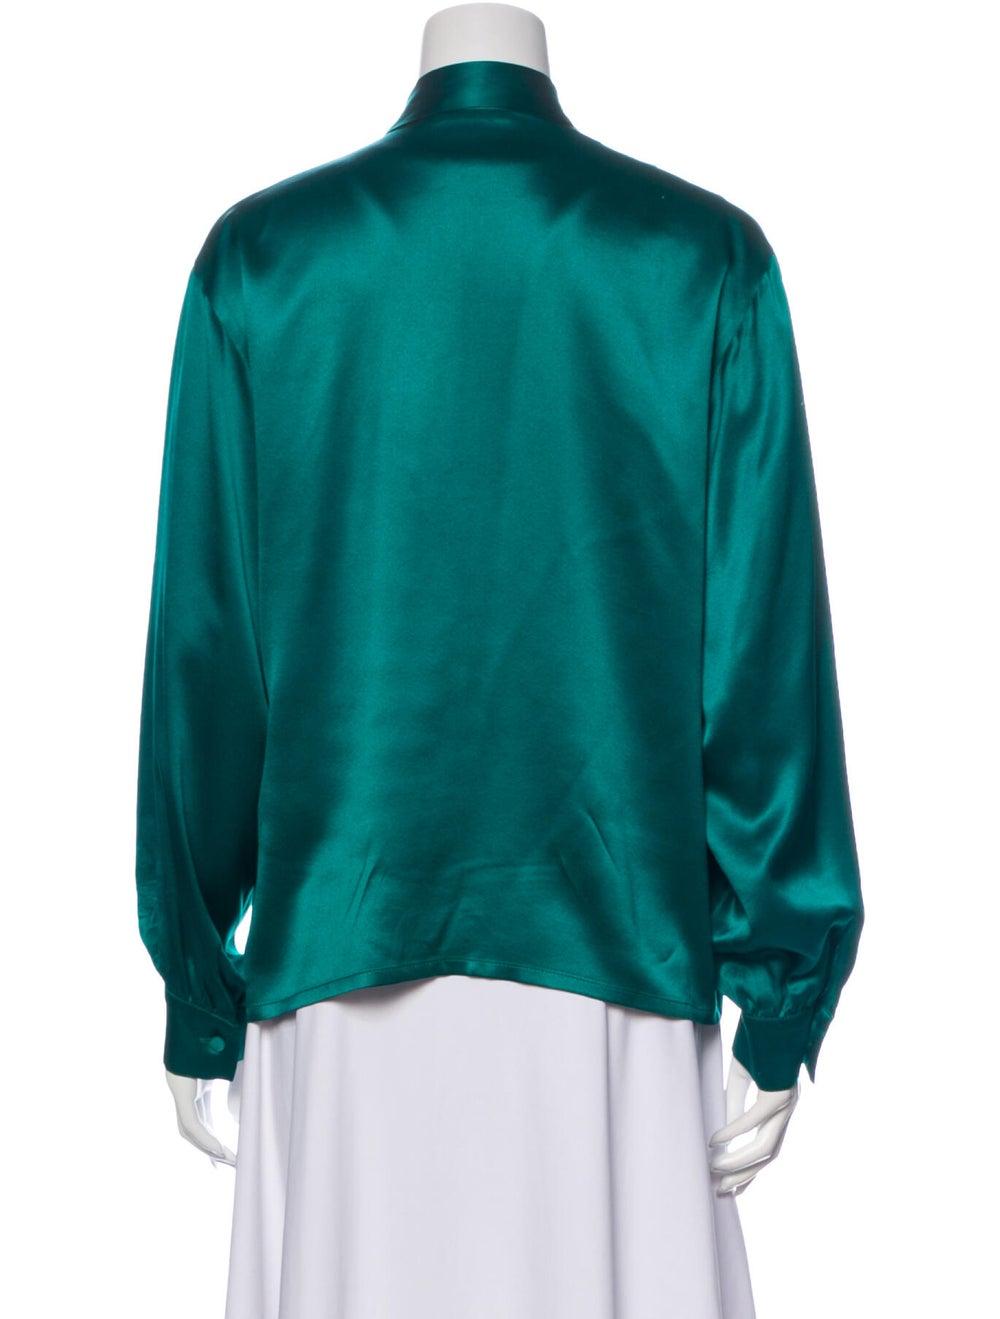 Christian Dior Vintage Silk Blouse Green - image 3